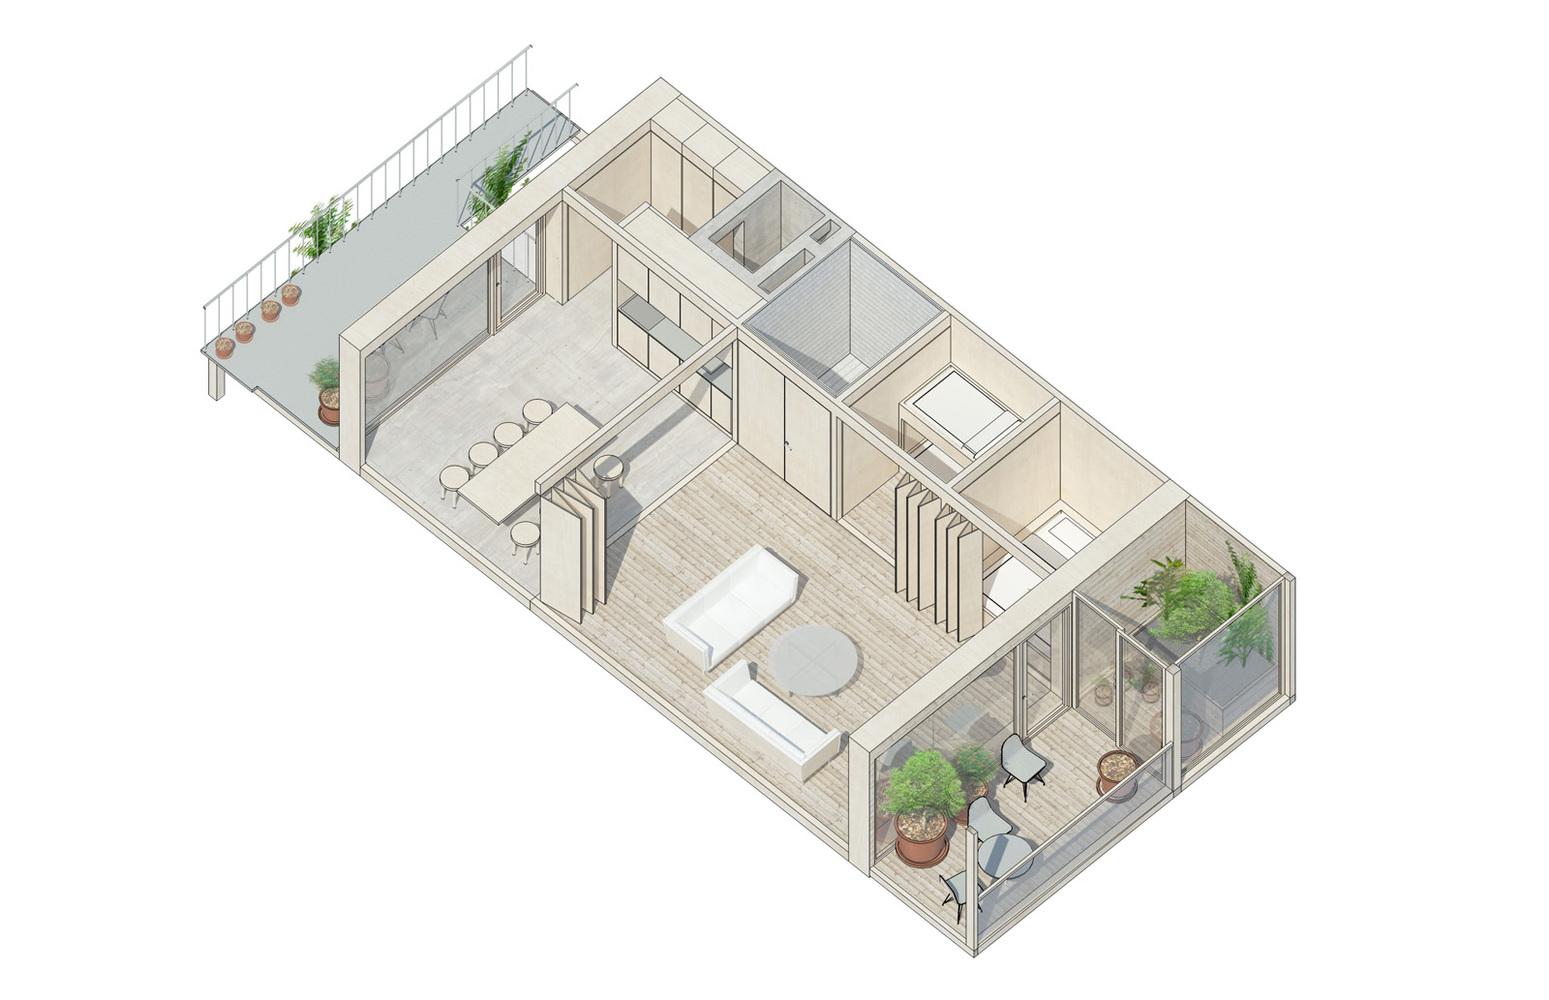 Kjellander Sjöberg S Winning Design Provides Sustainable Urban Living In Malmö Sweden